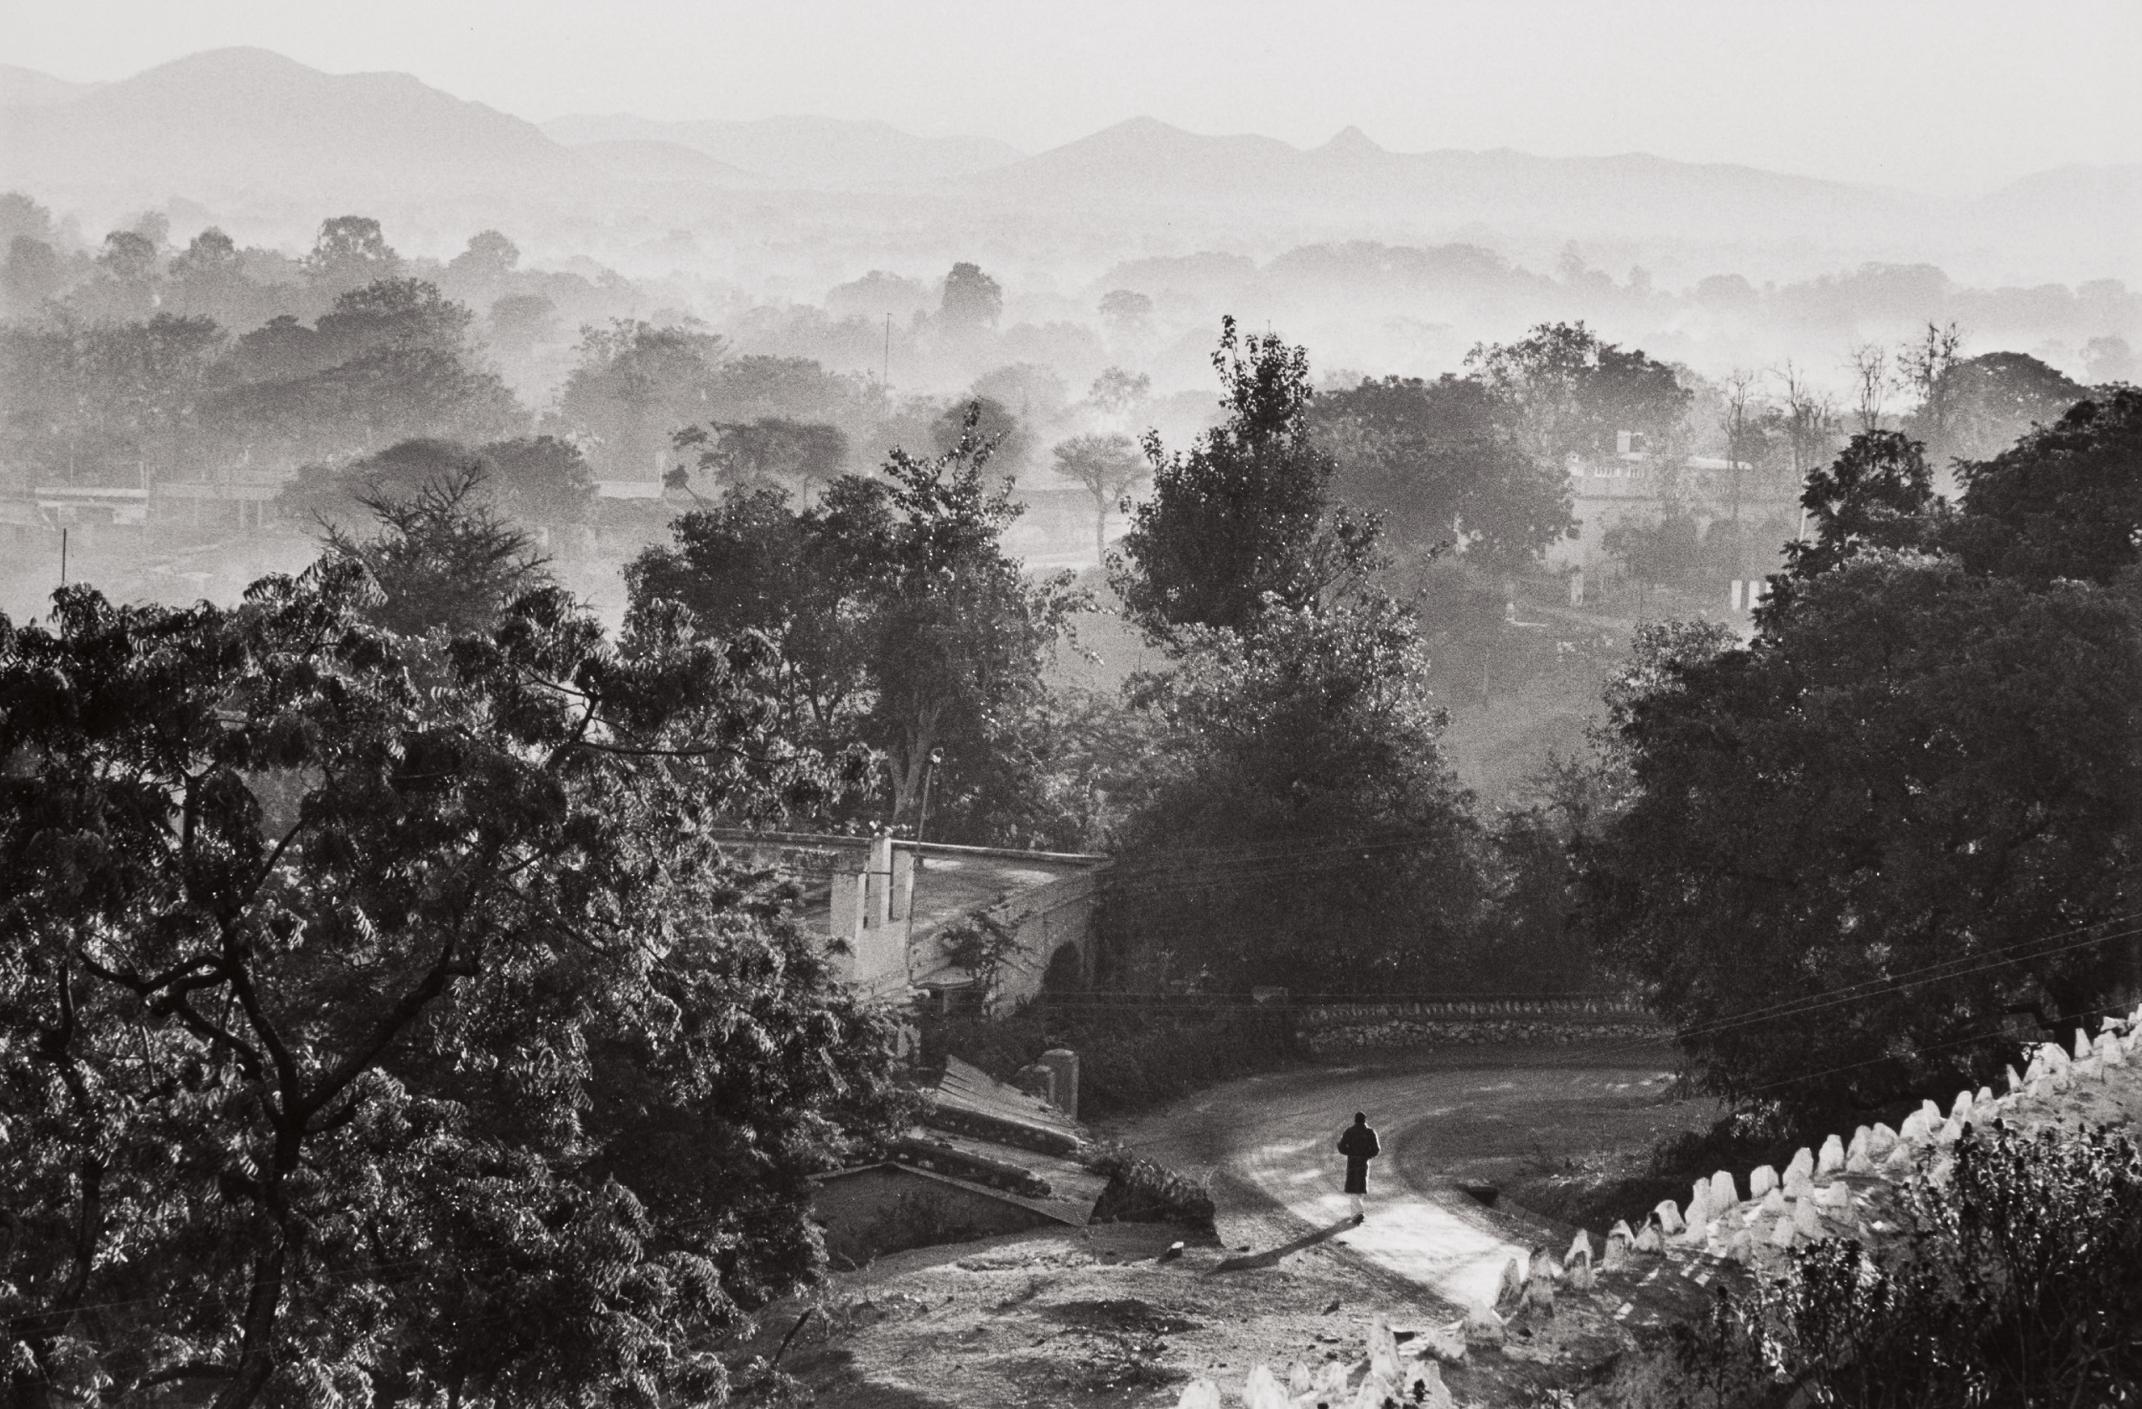 Henri Cartier-Bresson-Udaipur, Rajasthan, India-1966